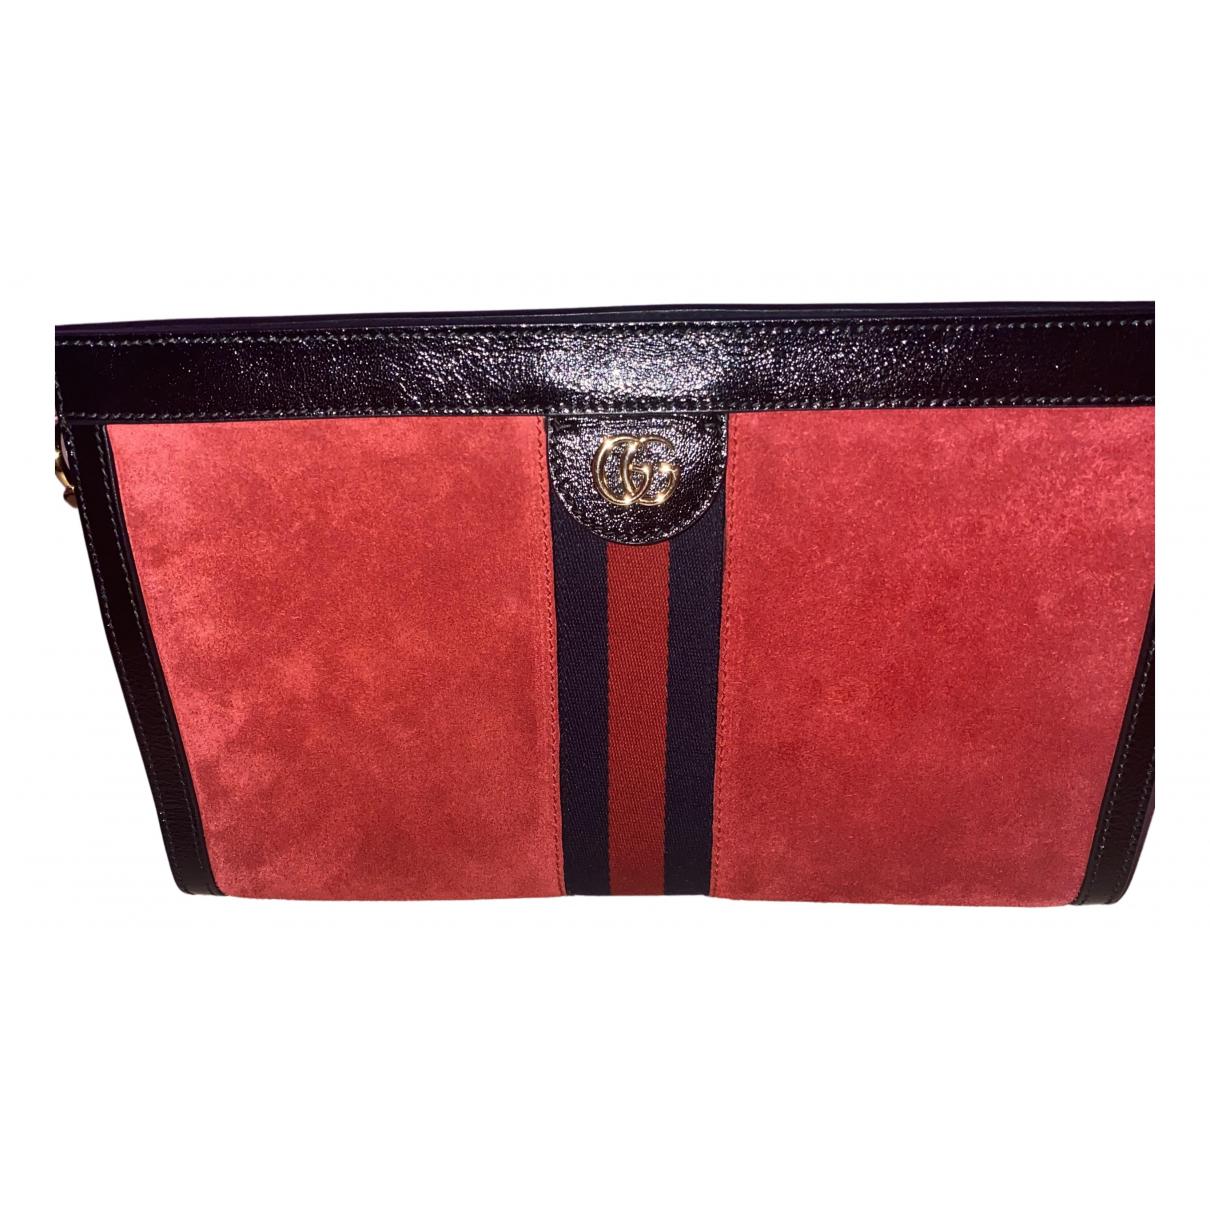 Gucci N Red Suede Clutch bag for Women N